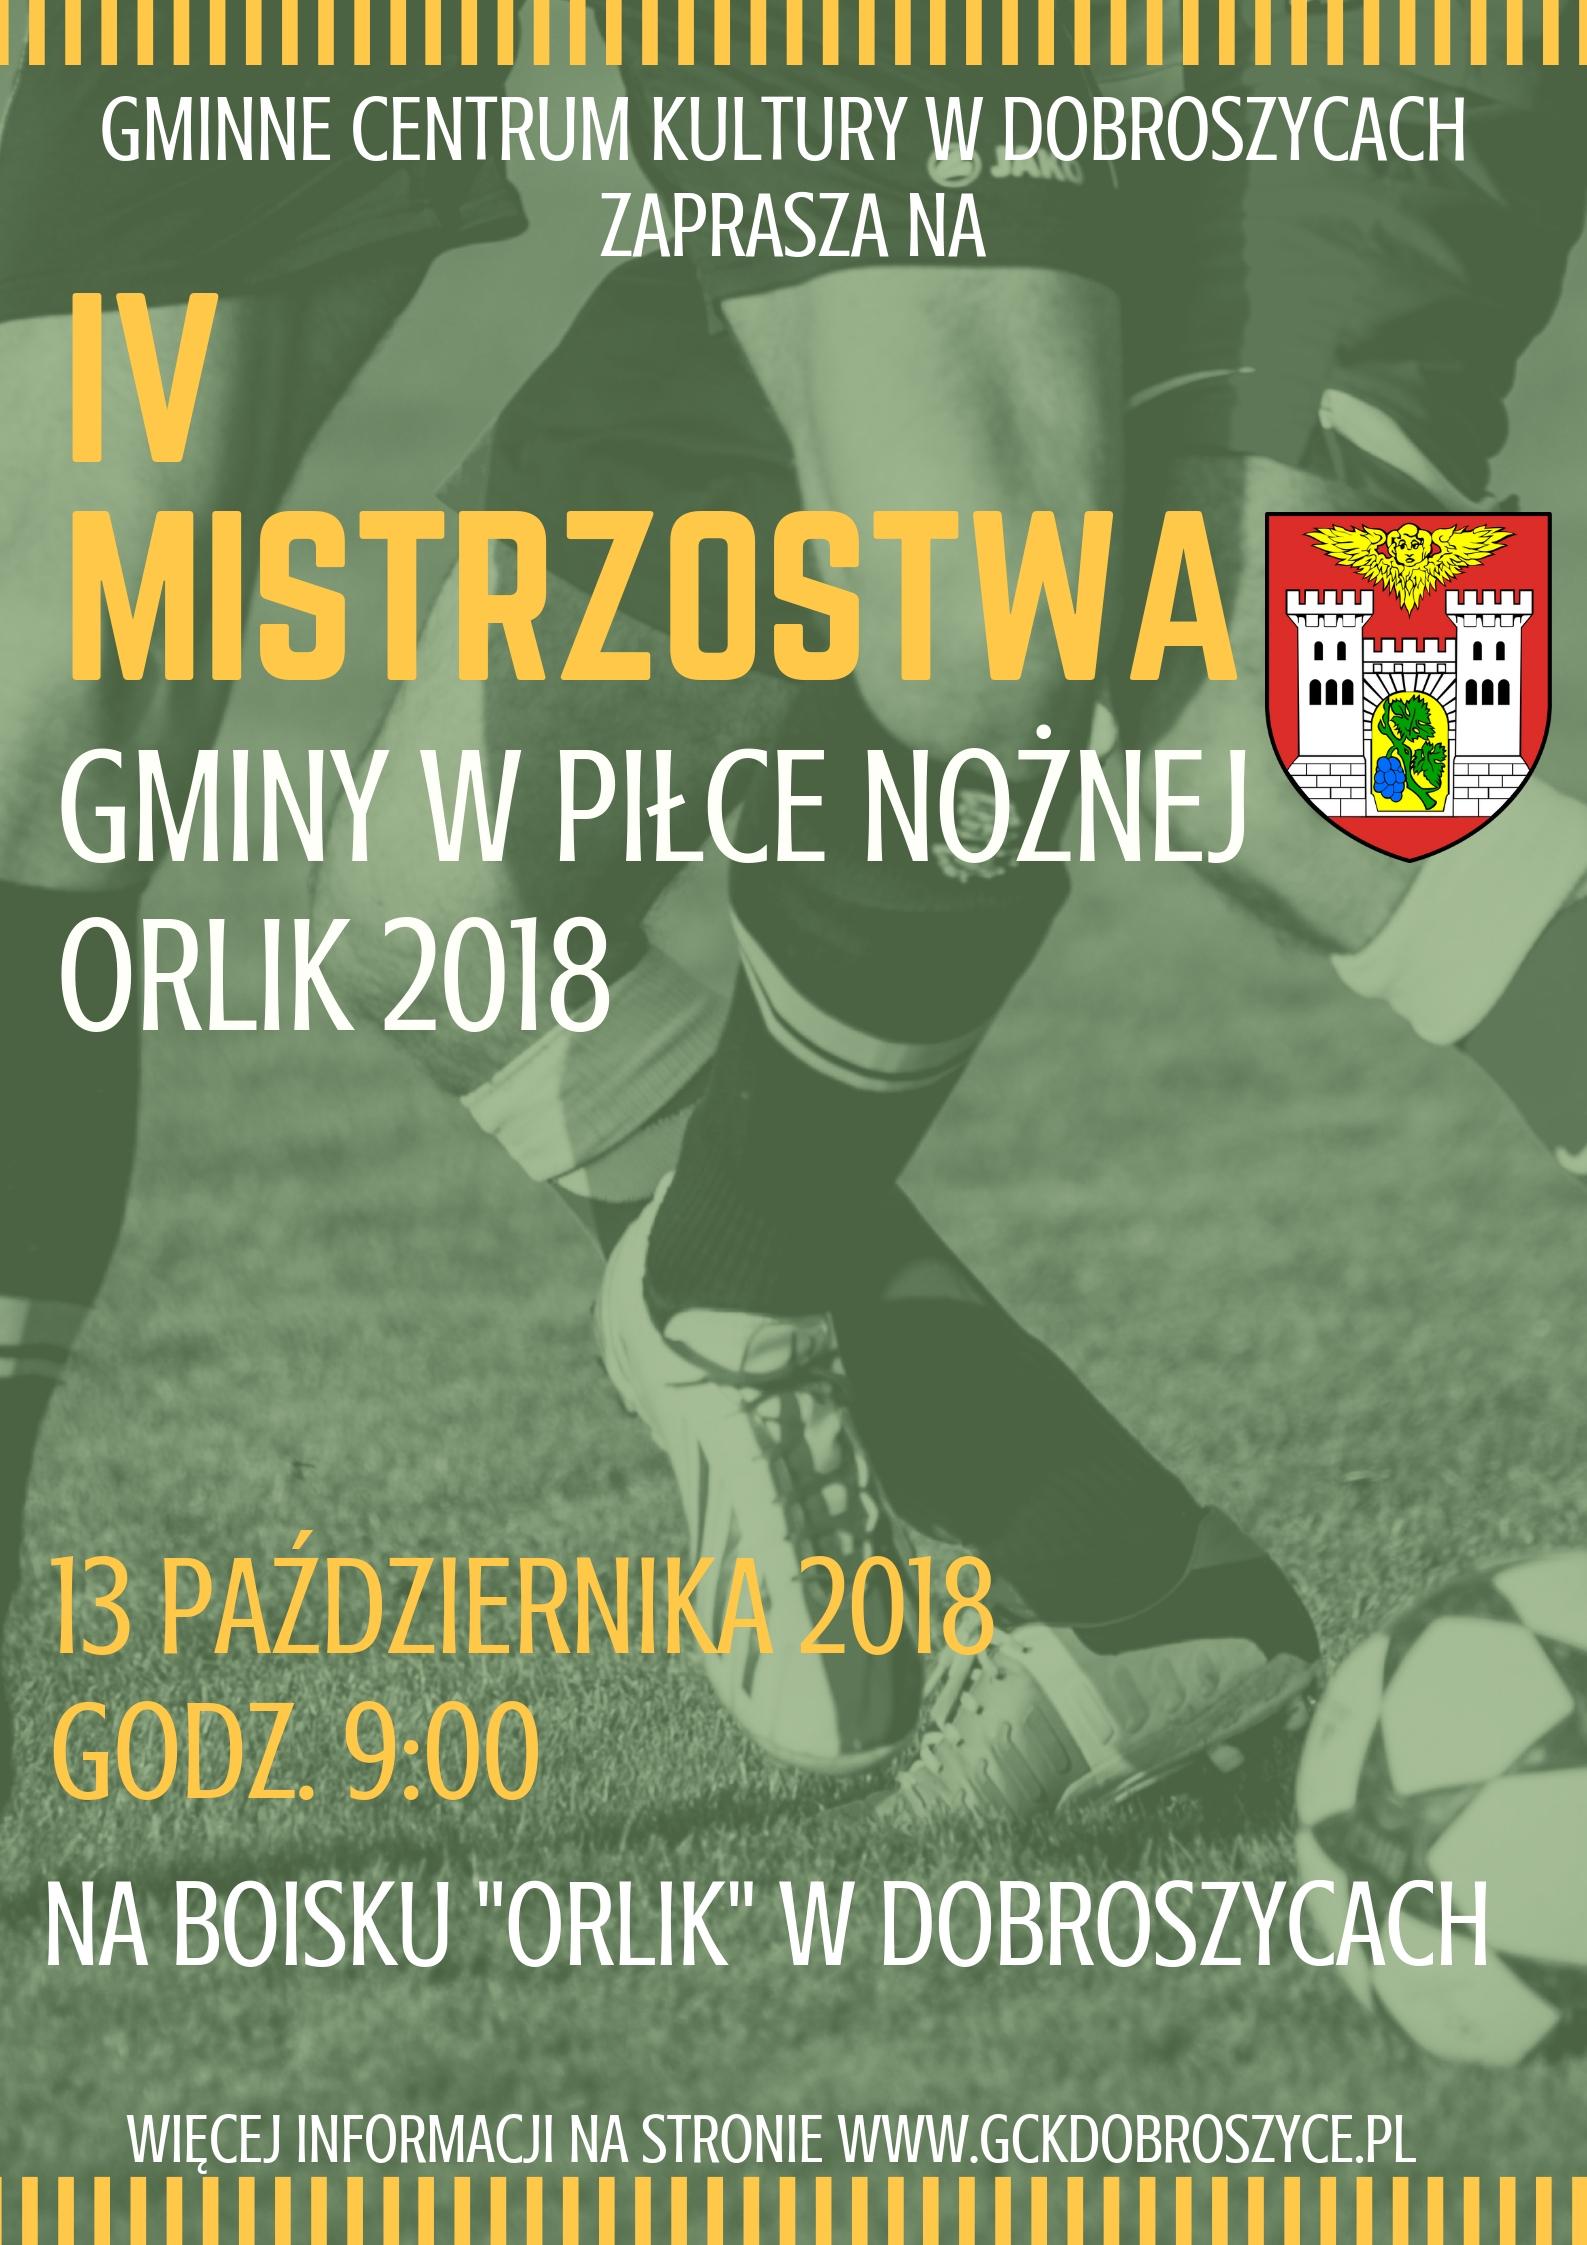 Green Tint Football Fundraising Poster